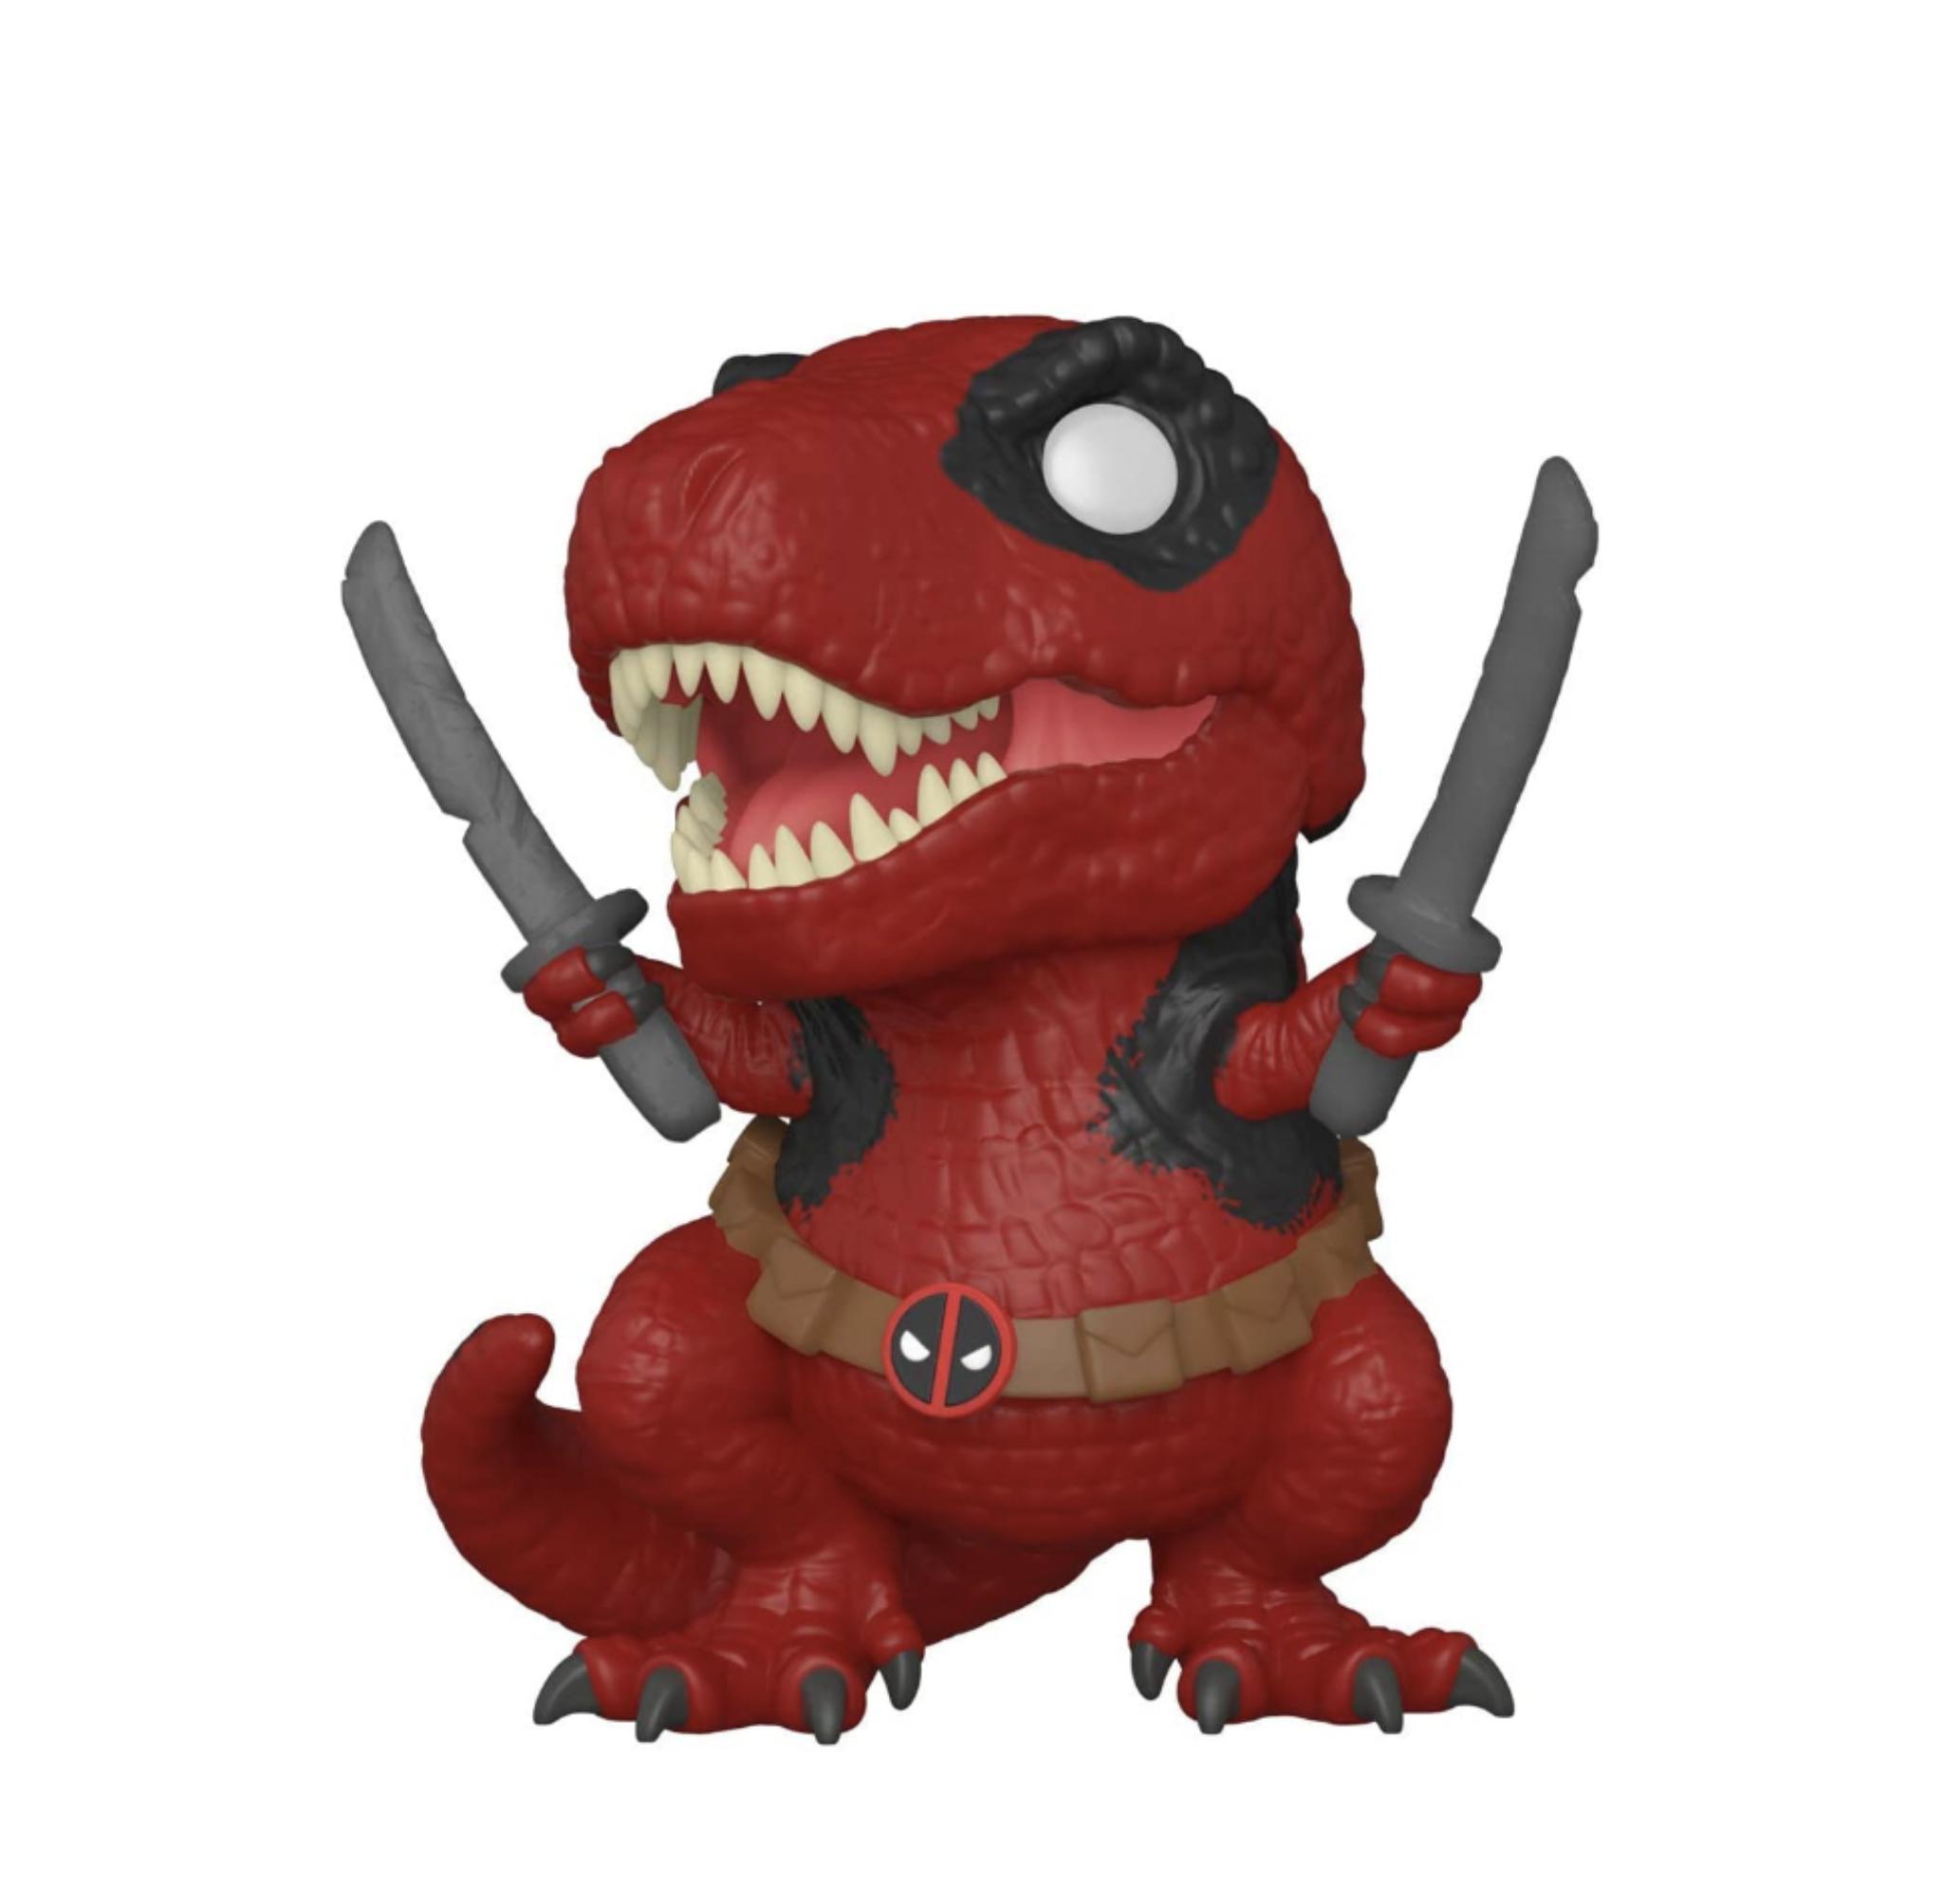 Amazon: Funko Pop Deadpool 30th - Dinopool